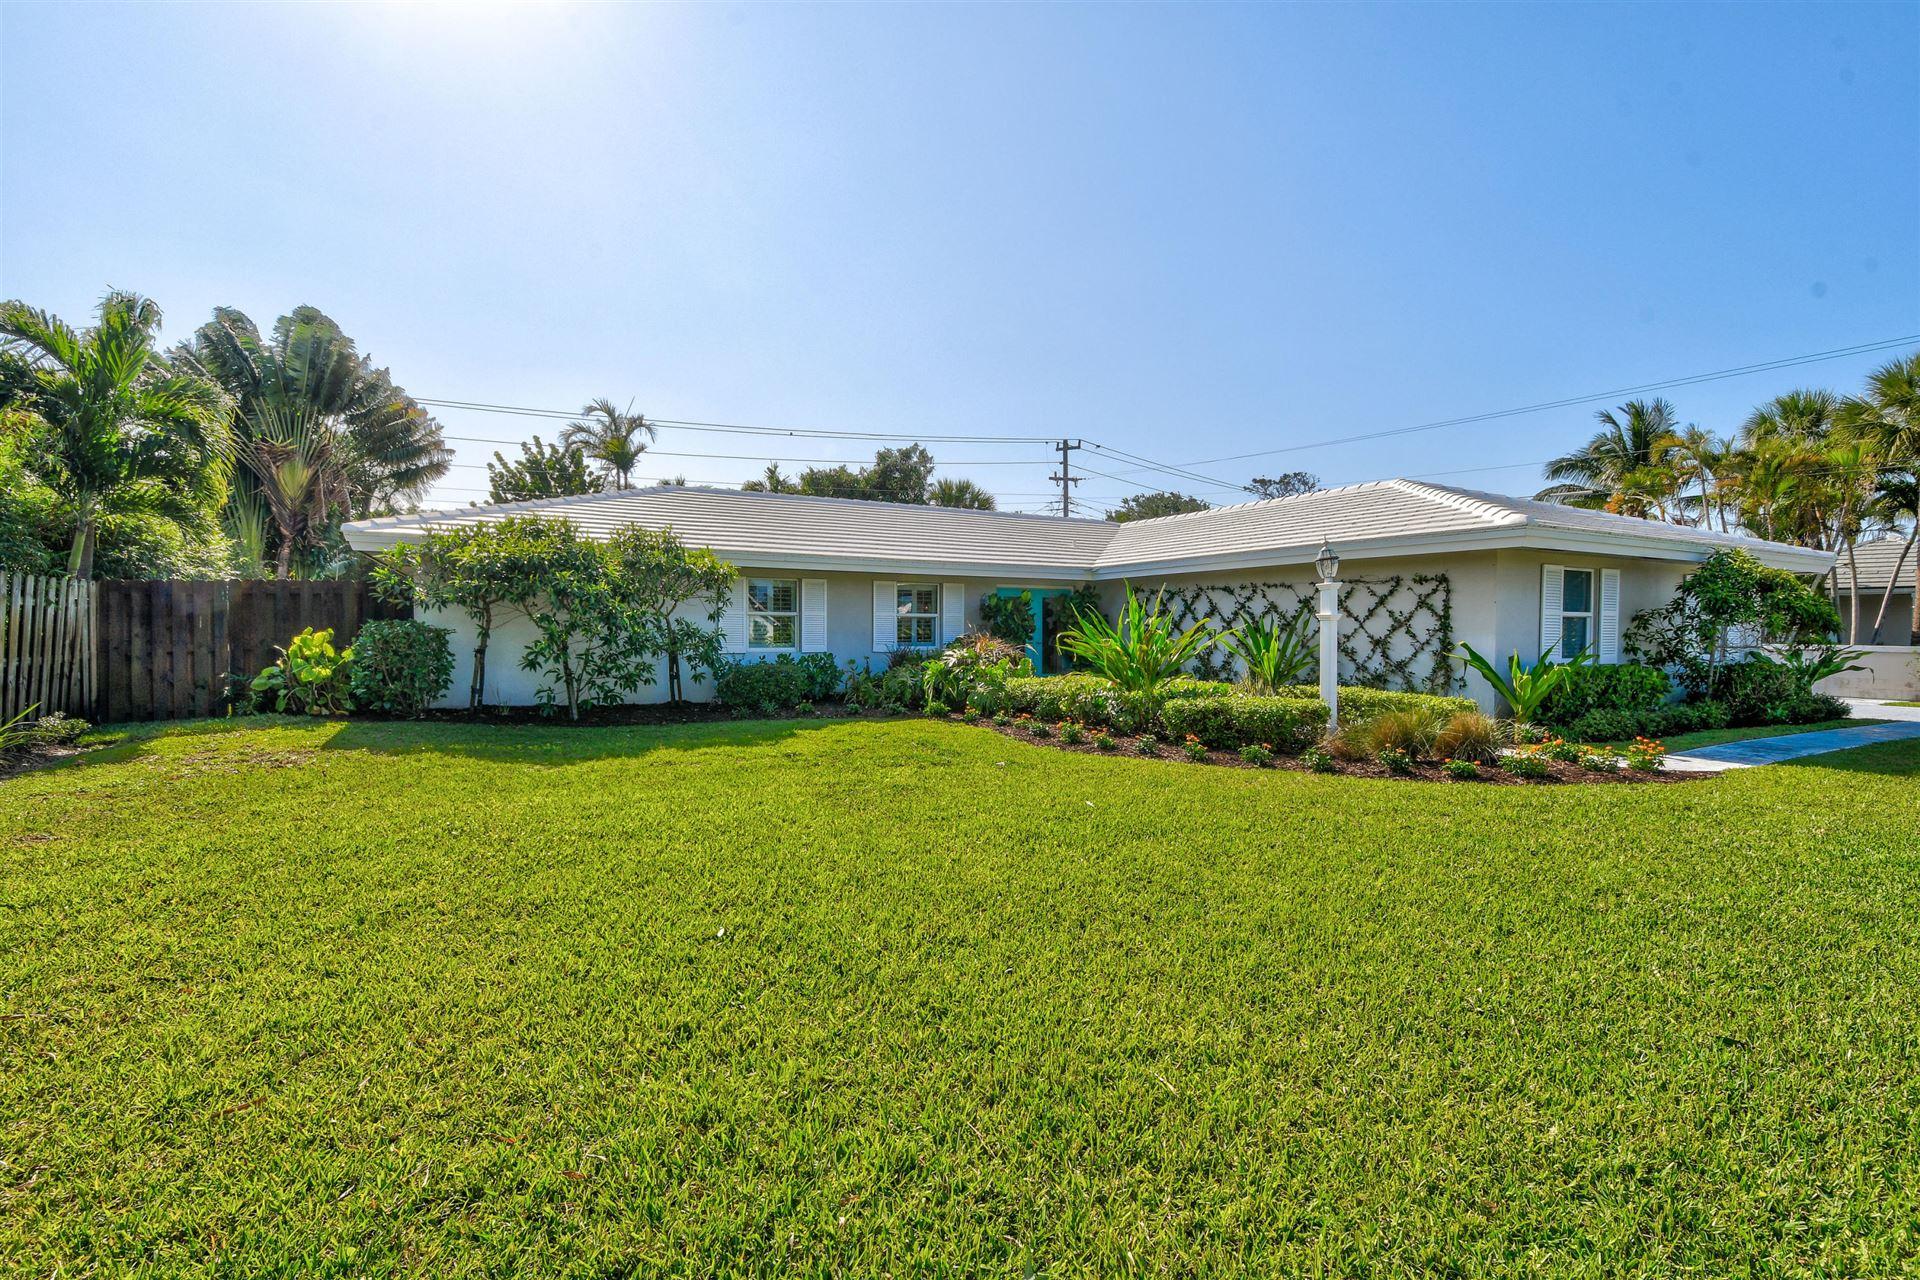 Photo of 201 Golfview Drive, Tequesta, FL 33469 (MLS # RX-10706030)